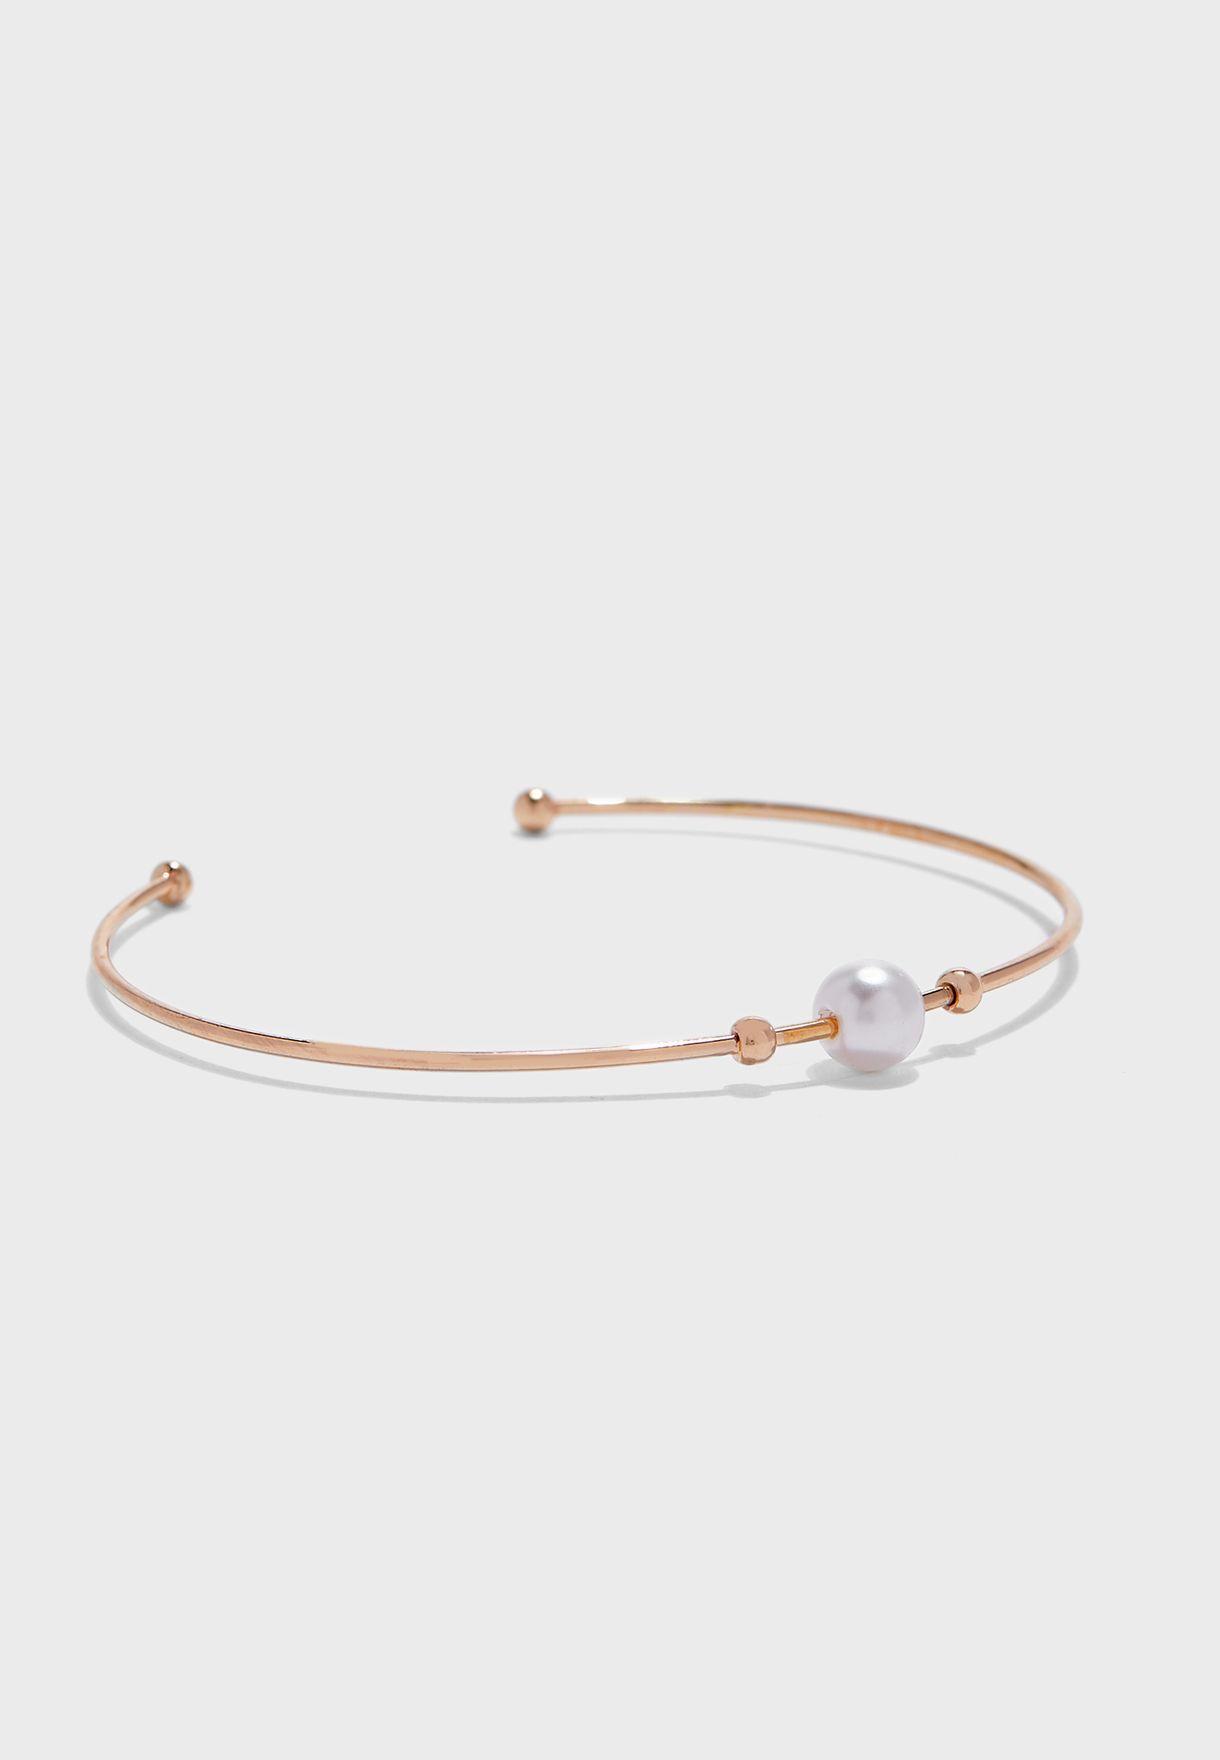 Legiavia Bracelet